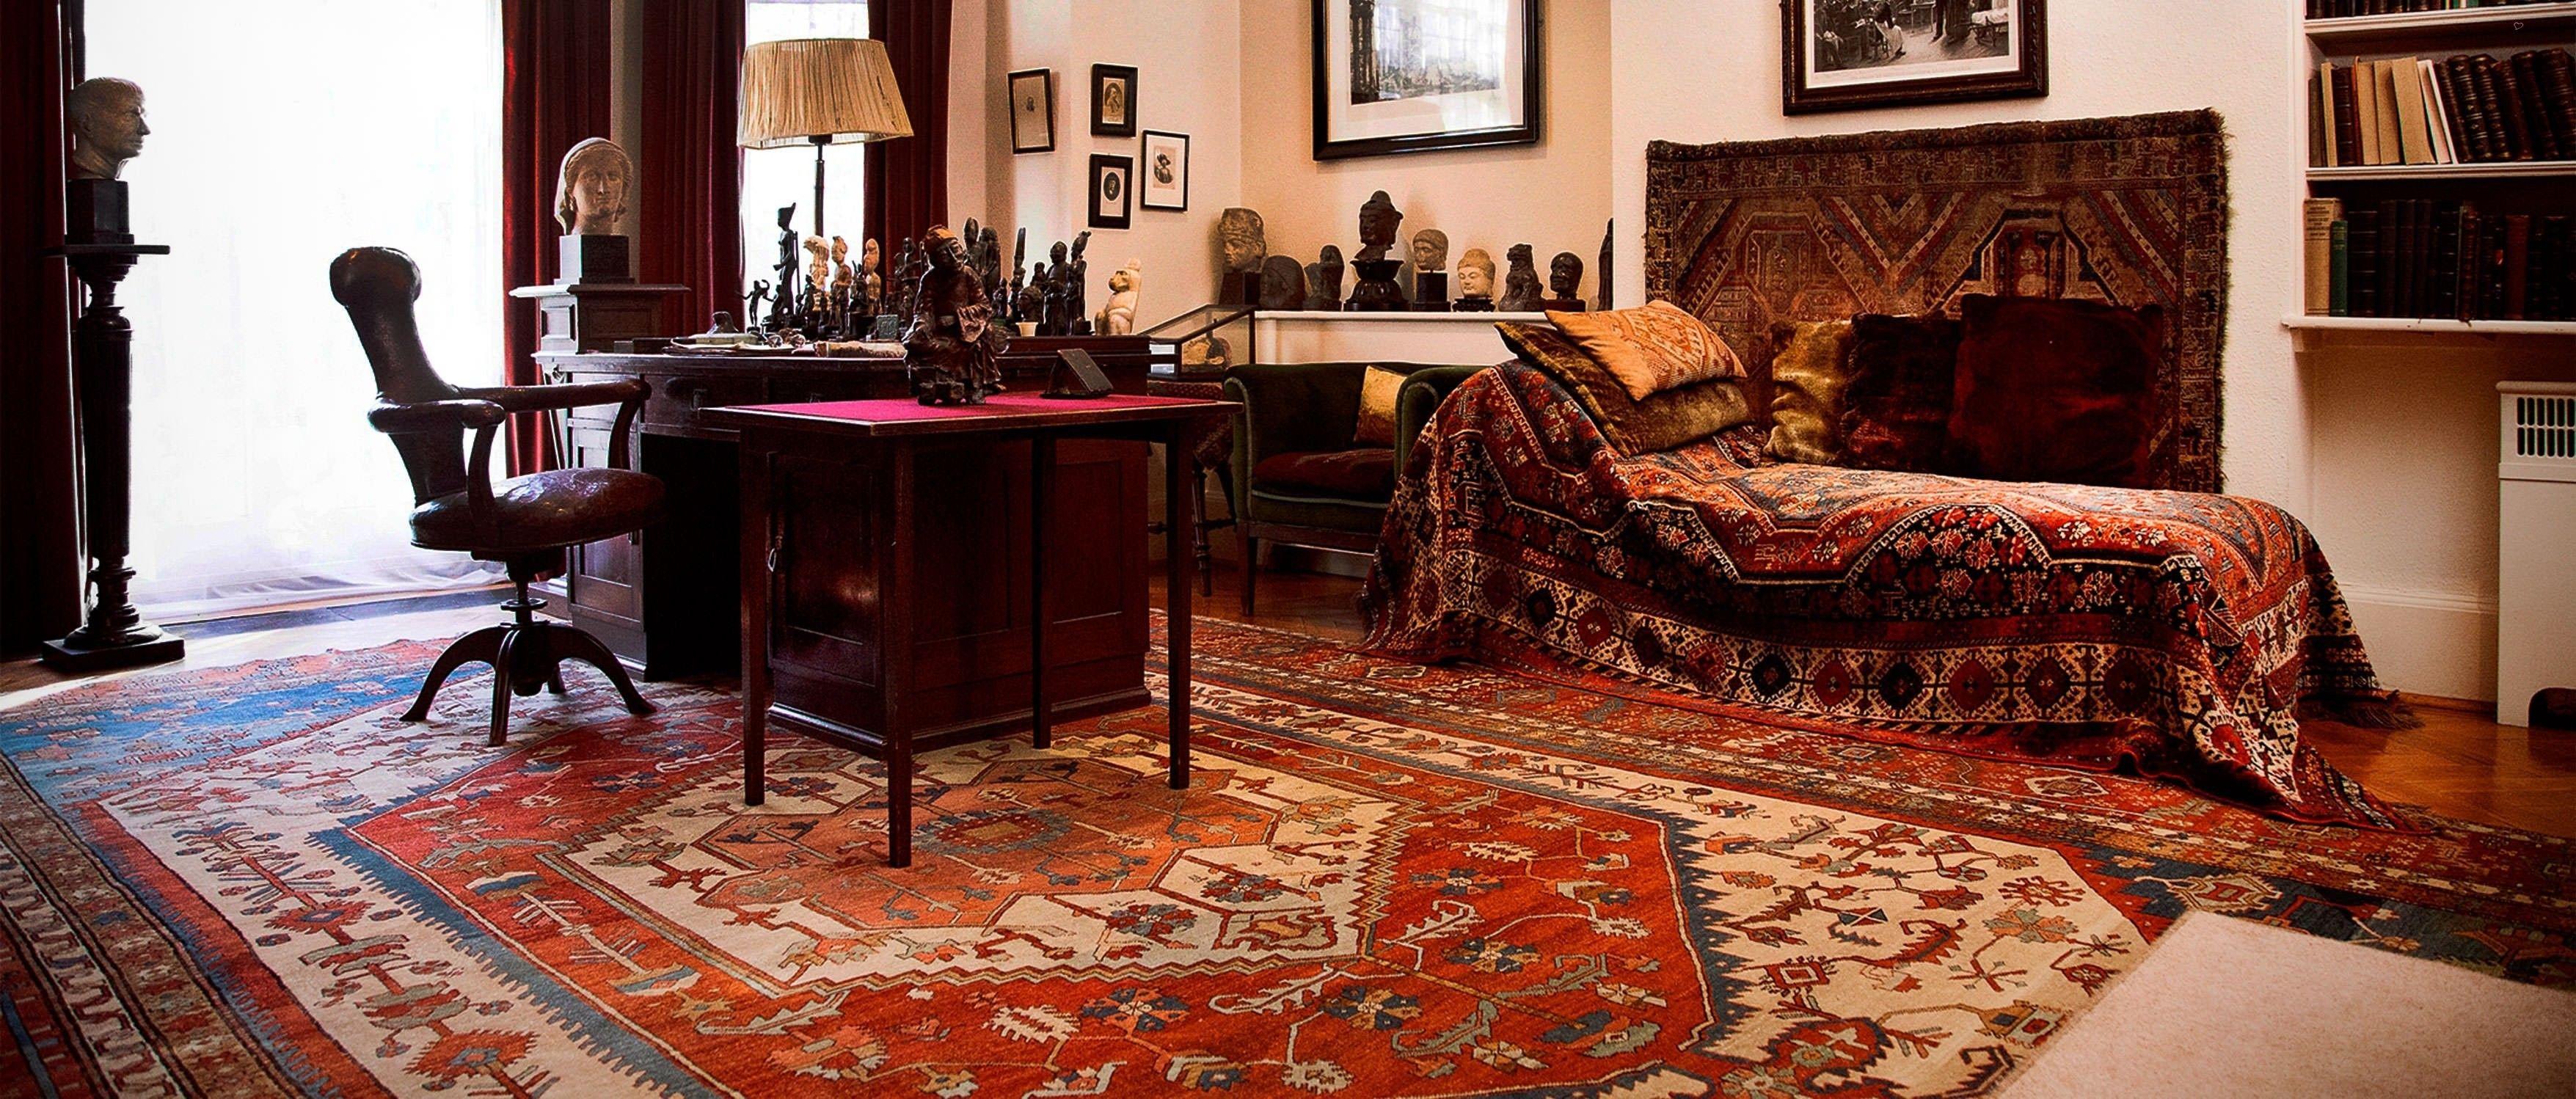 Sigmund Freuds Study Room